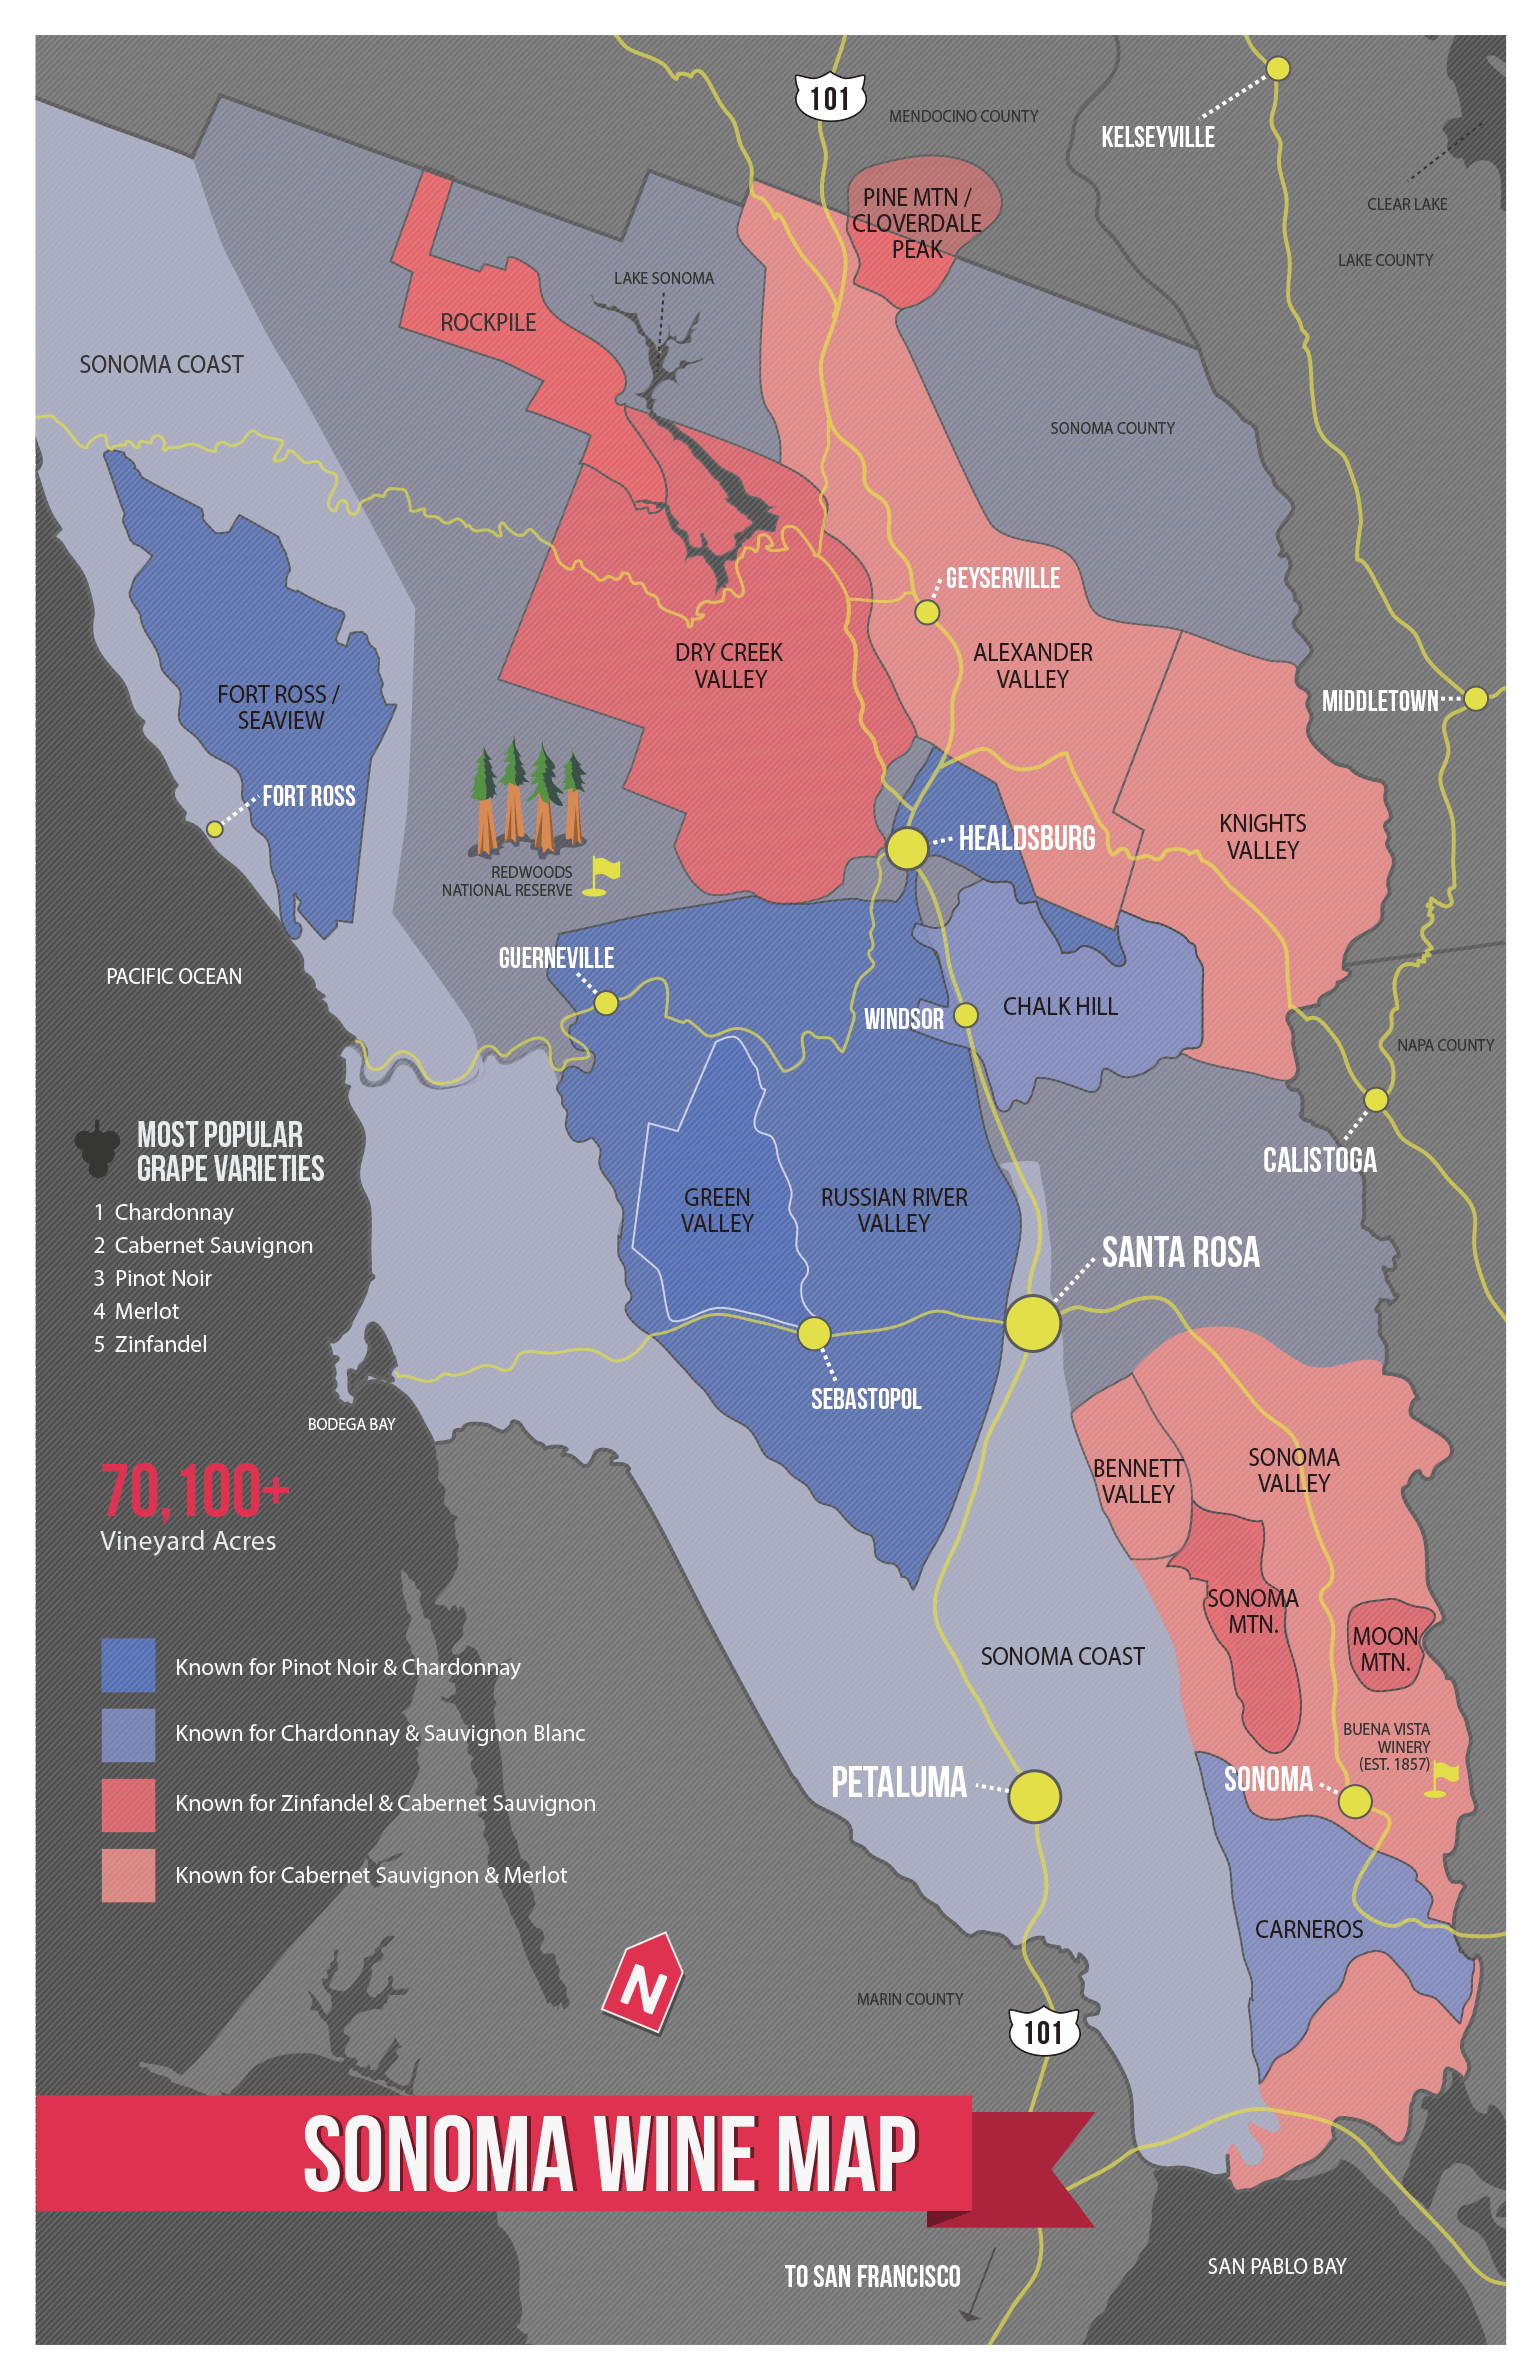 Sonoma Wine Map Poster